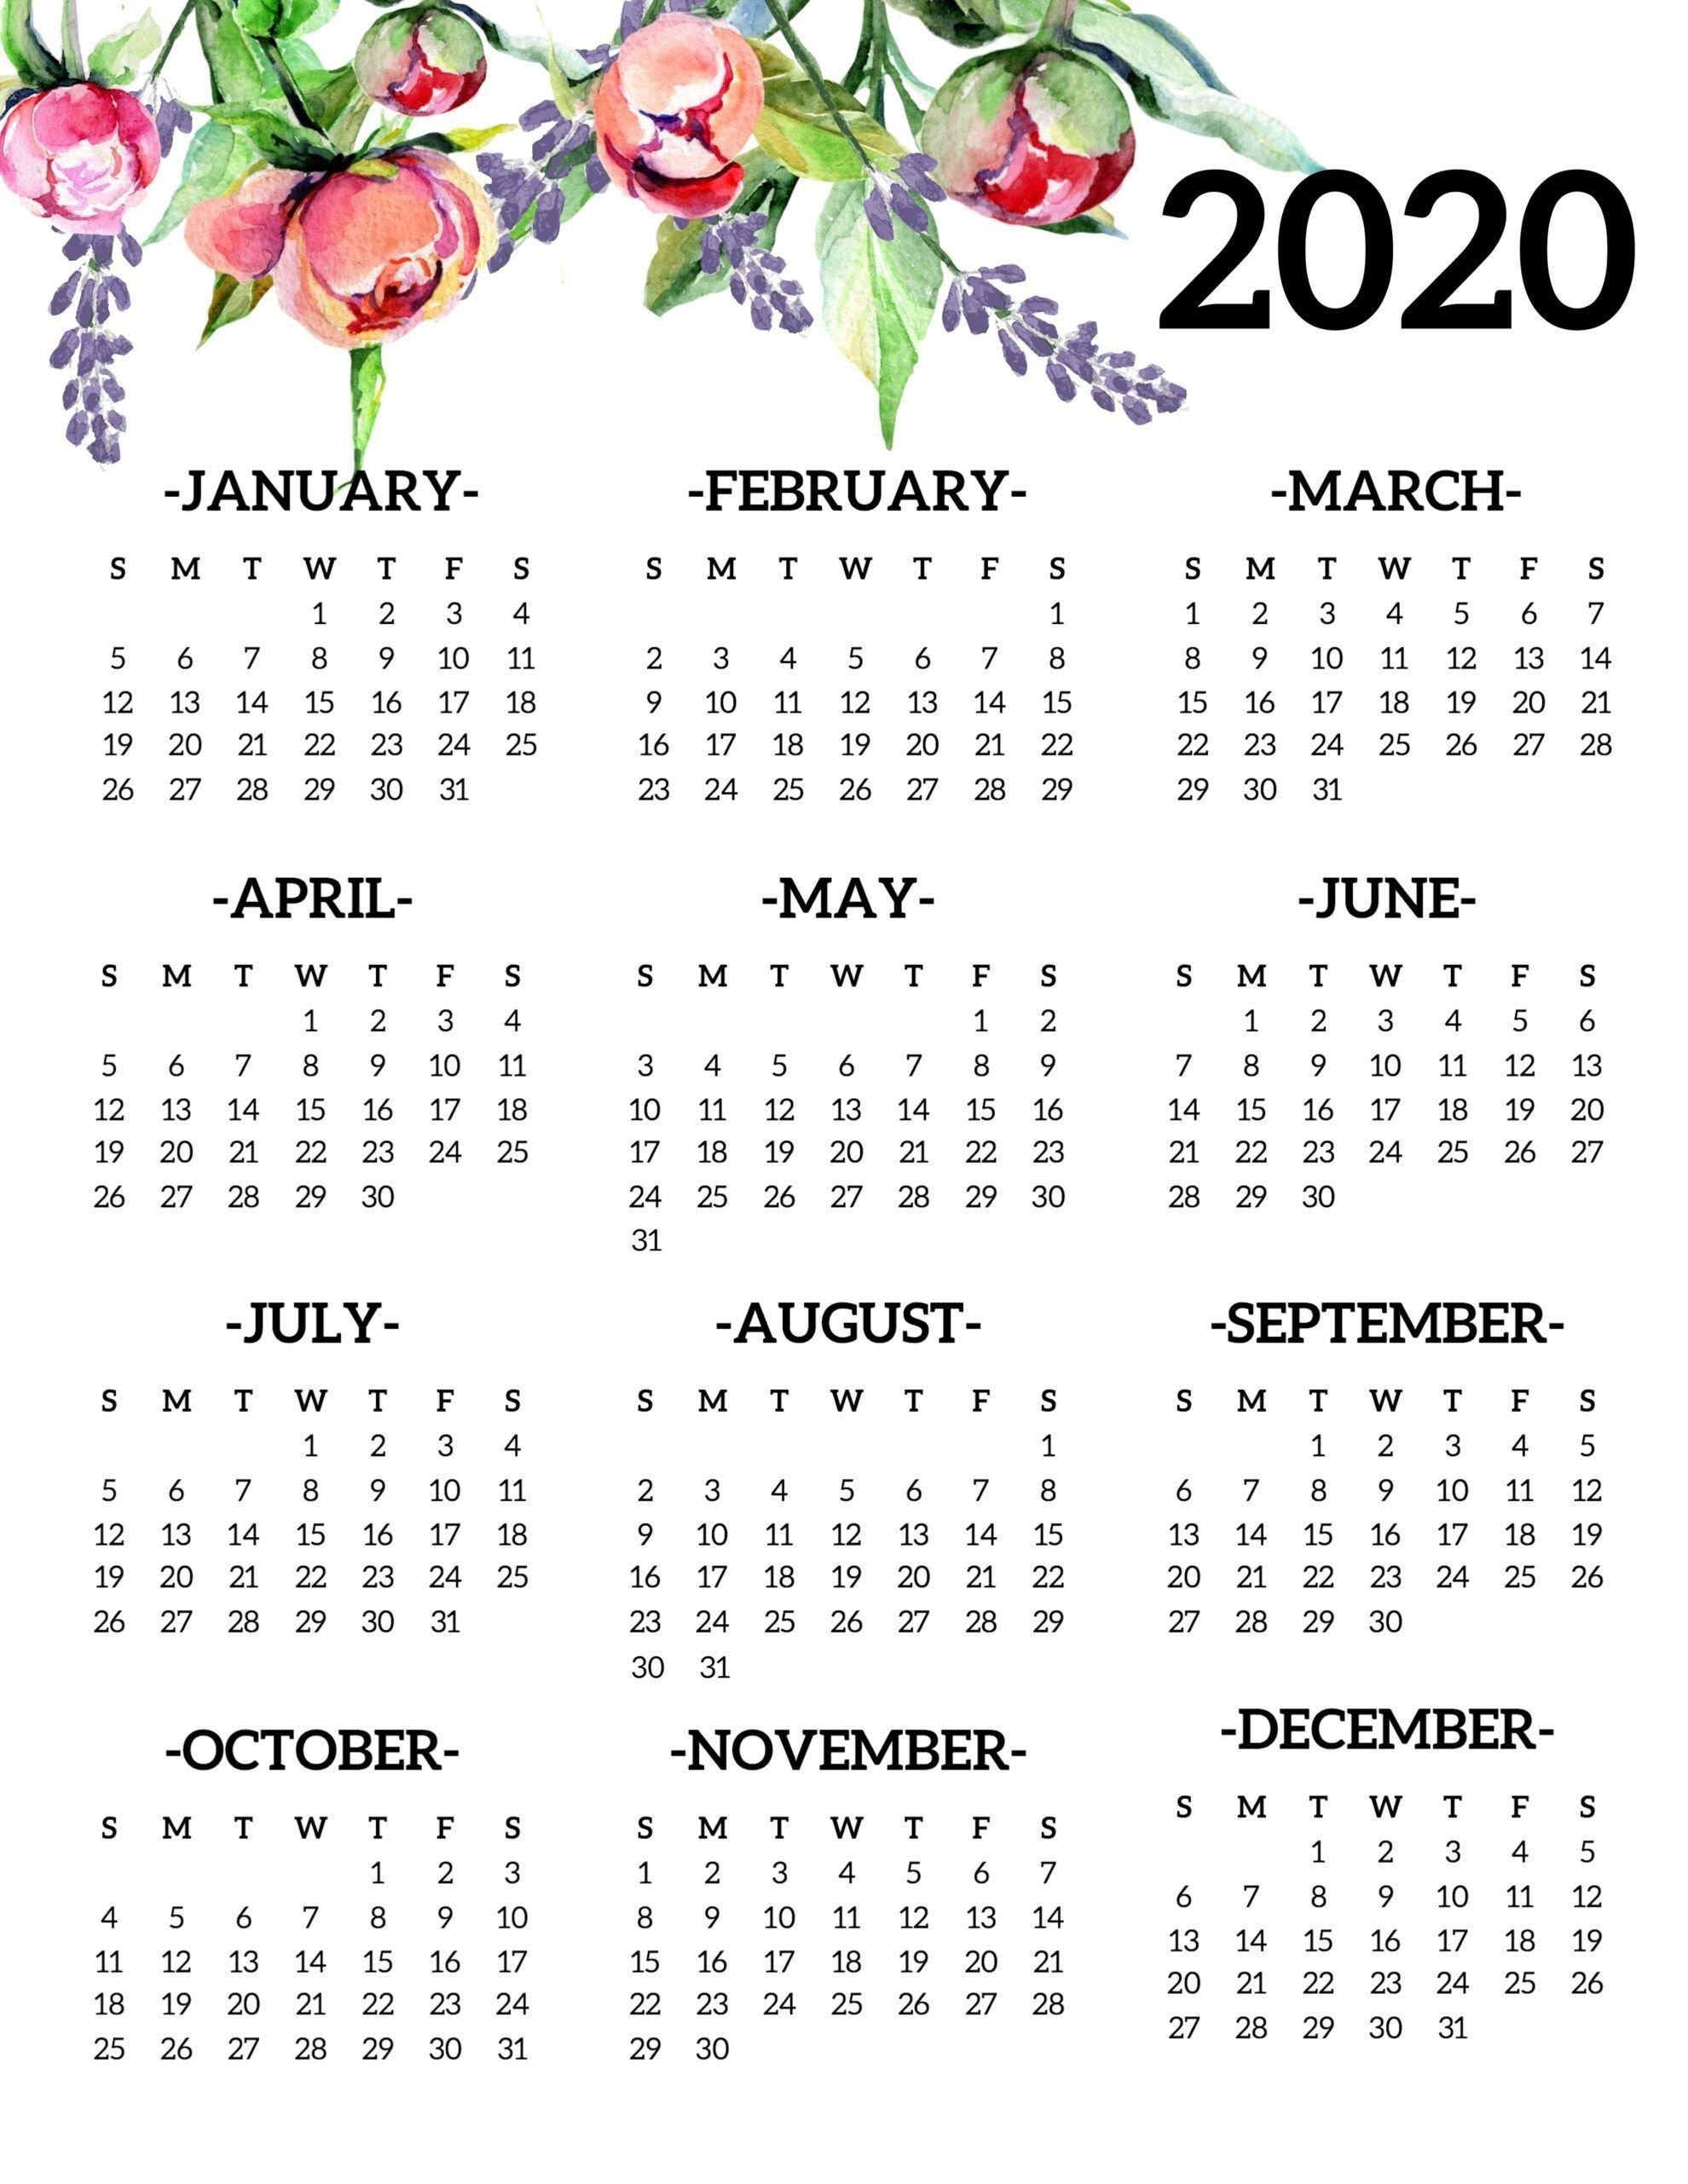 2020 Year Calendar Printable Free В 2020 Г | Шаблоны Free No Download Printable Calendars